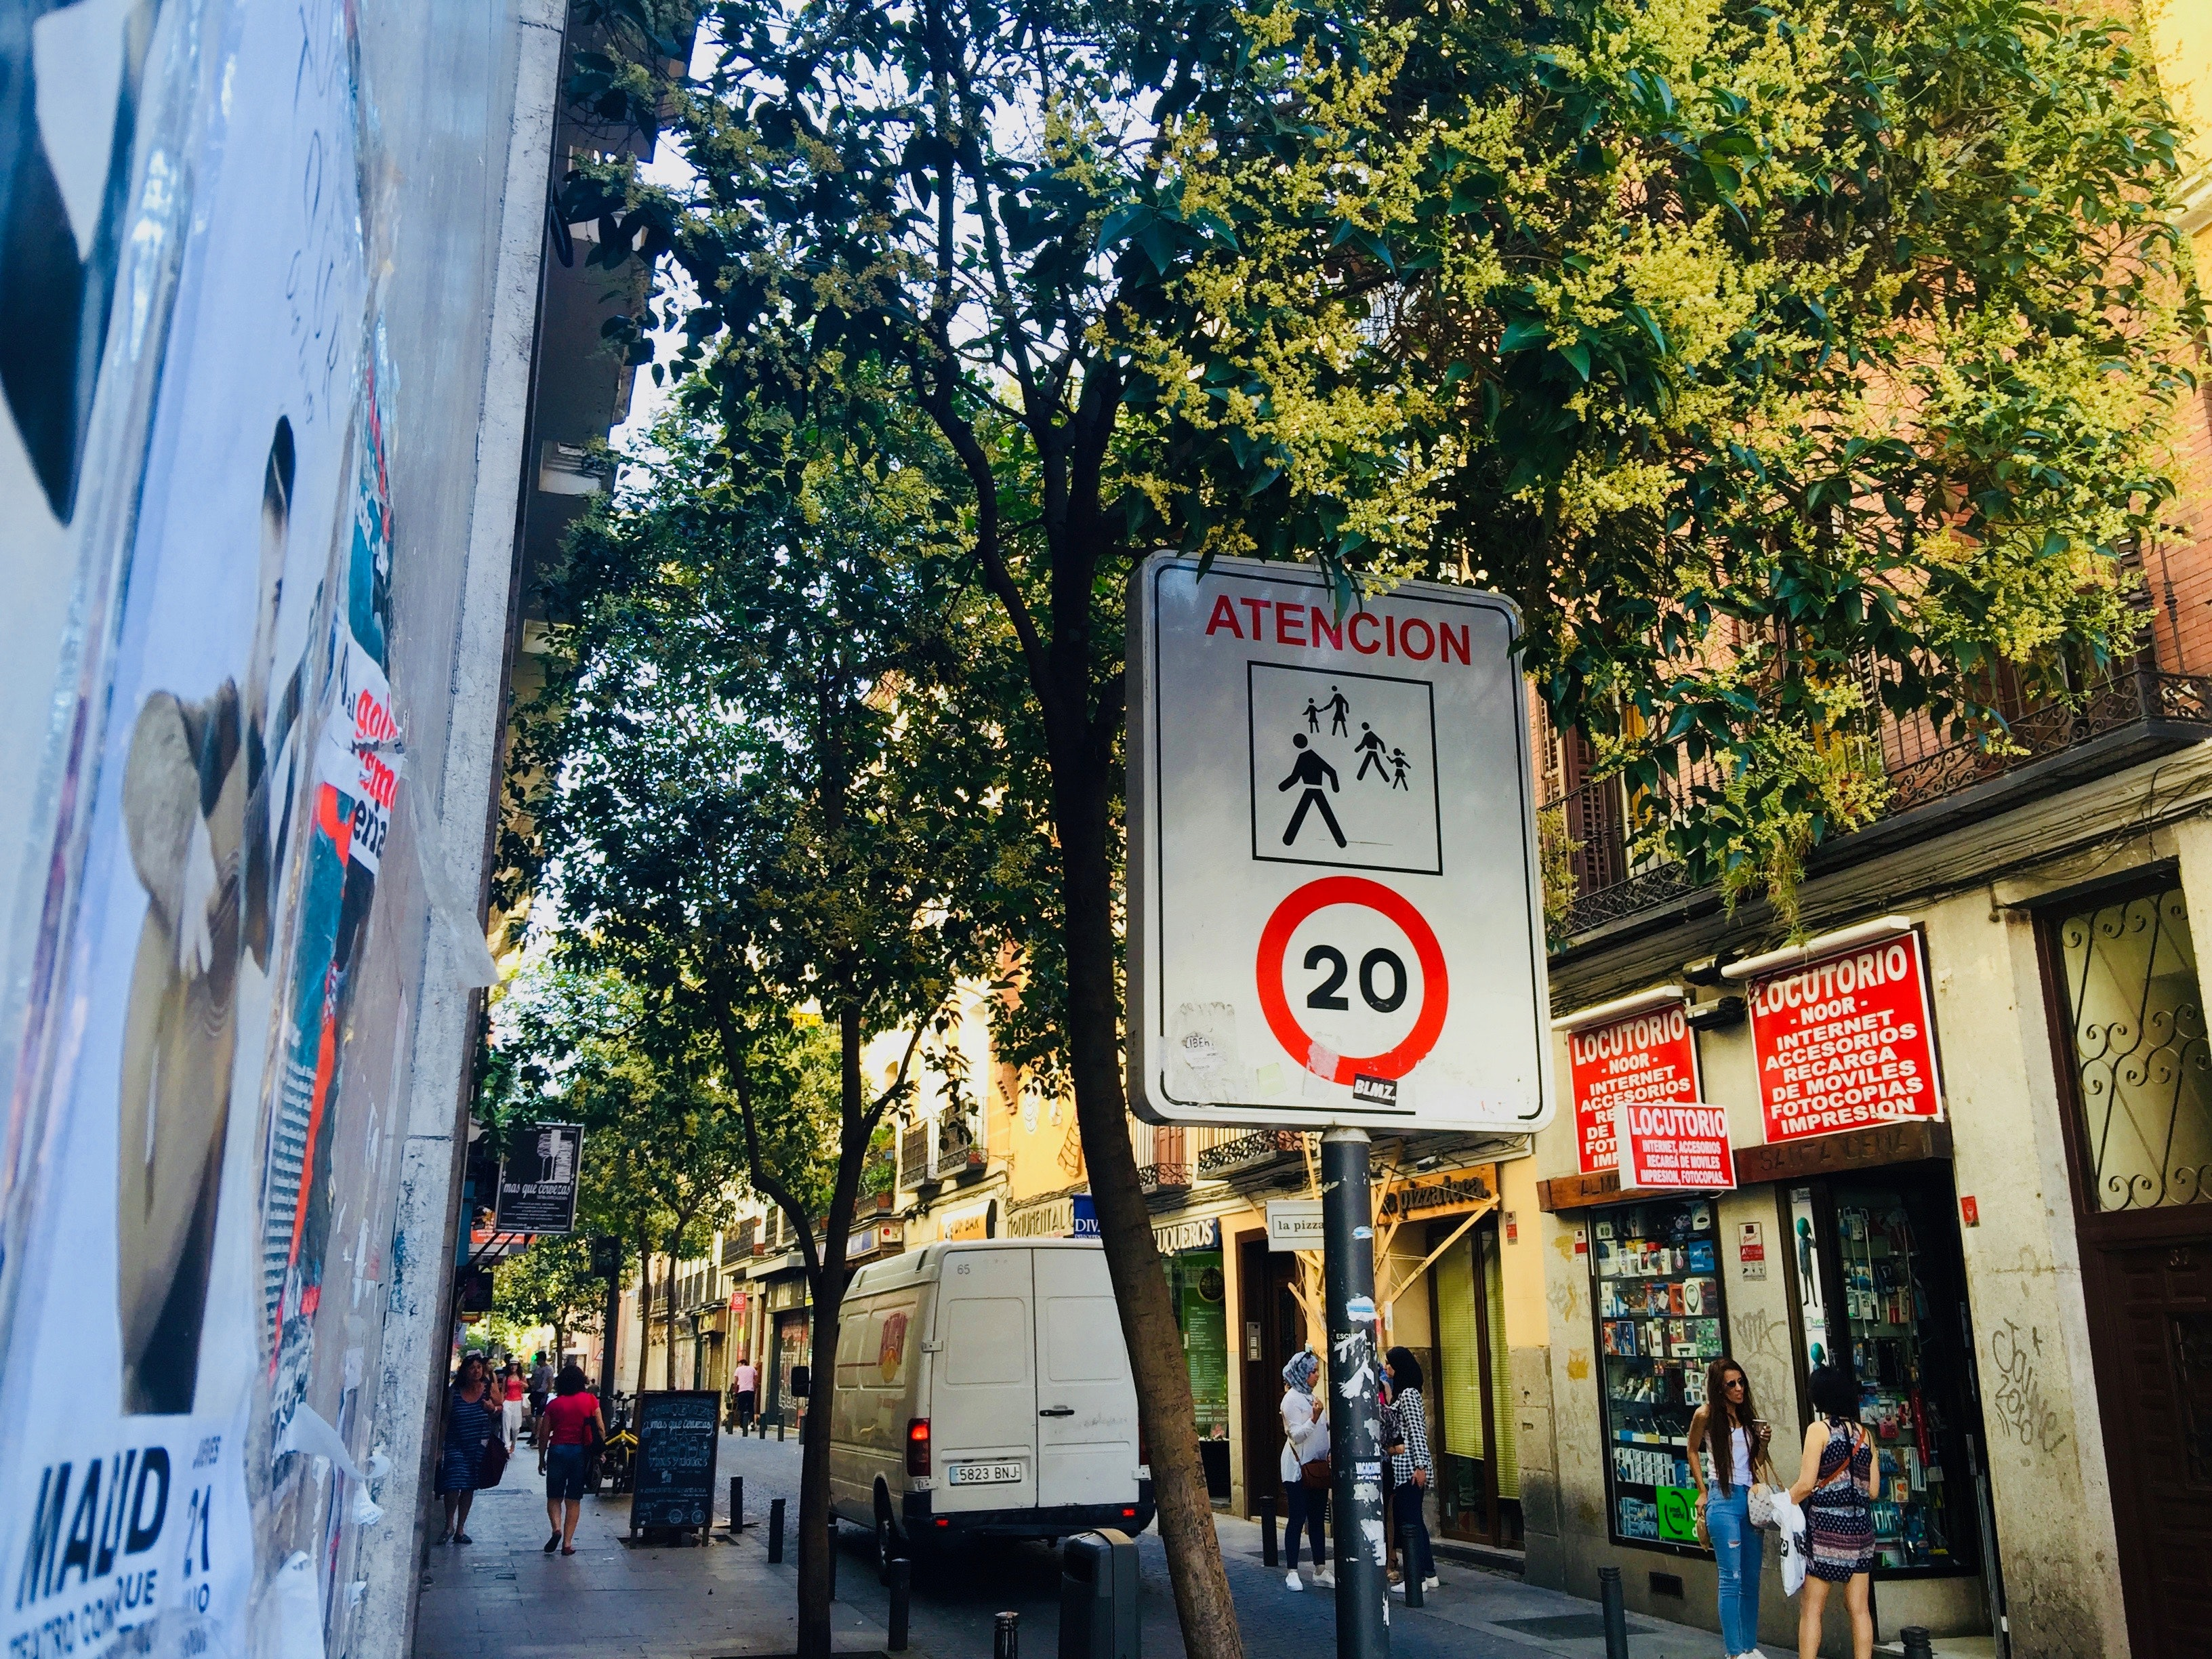 Atencion 20 road sign photo